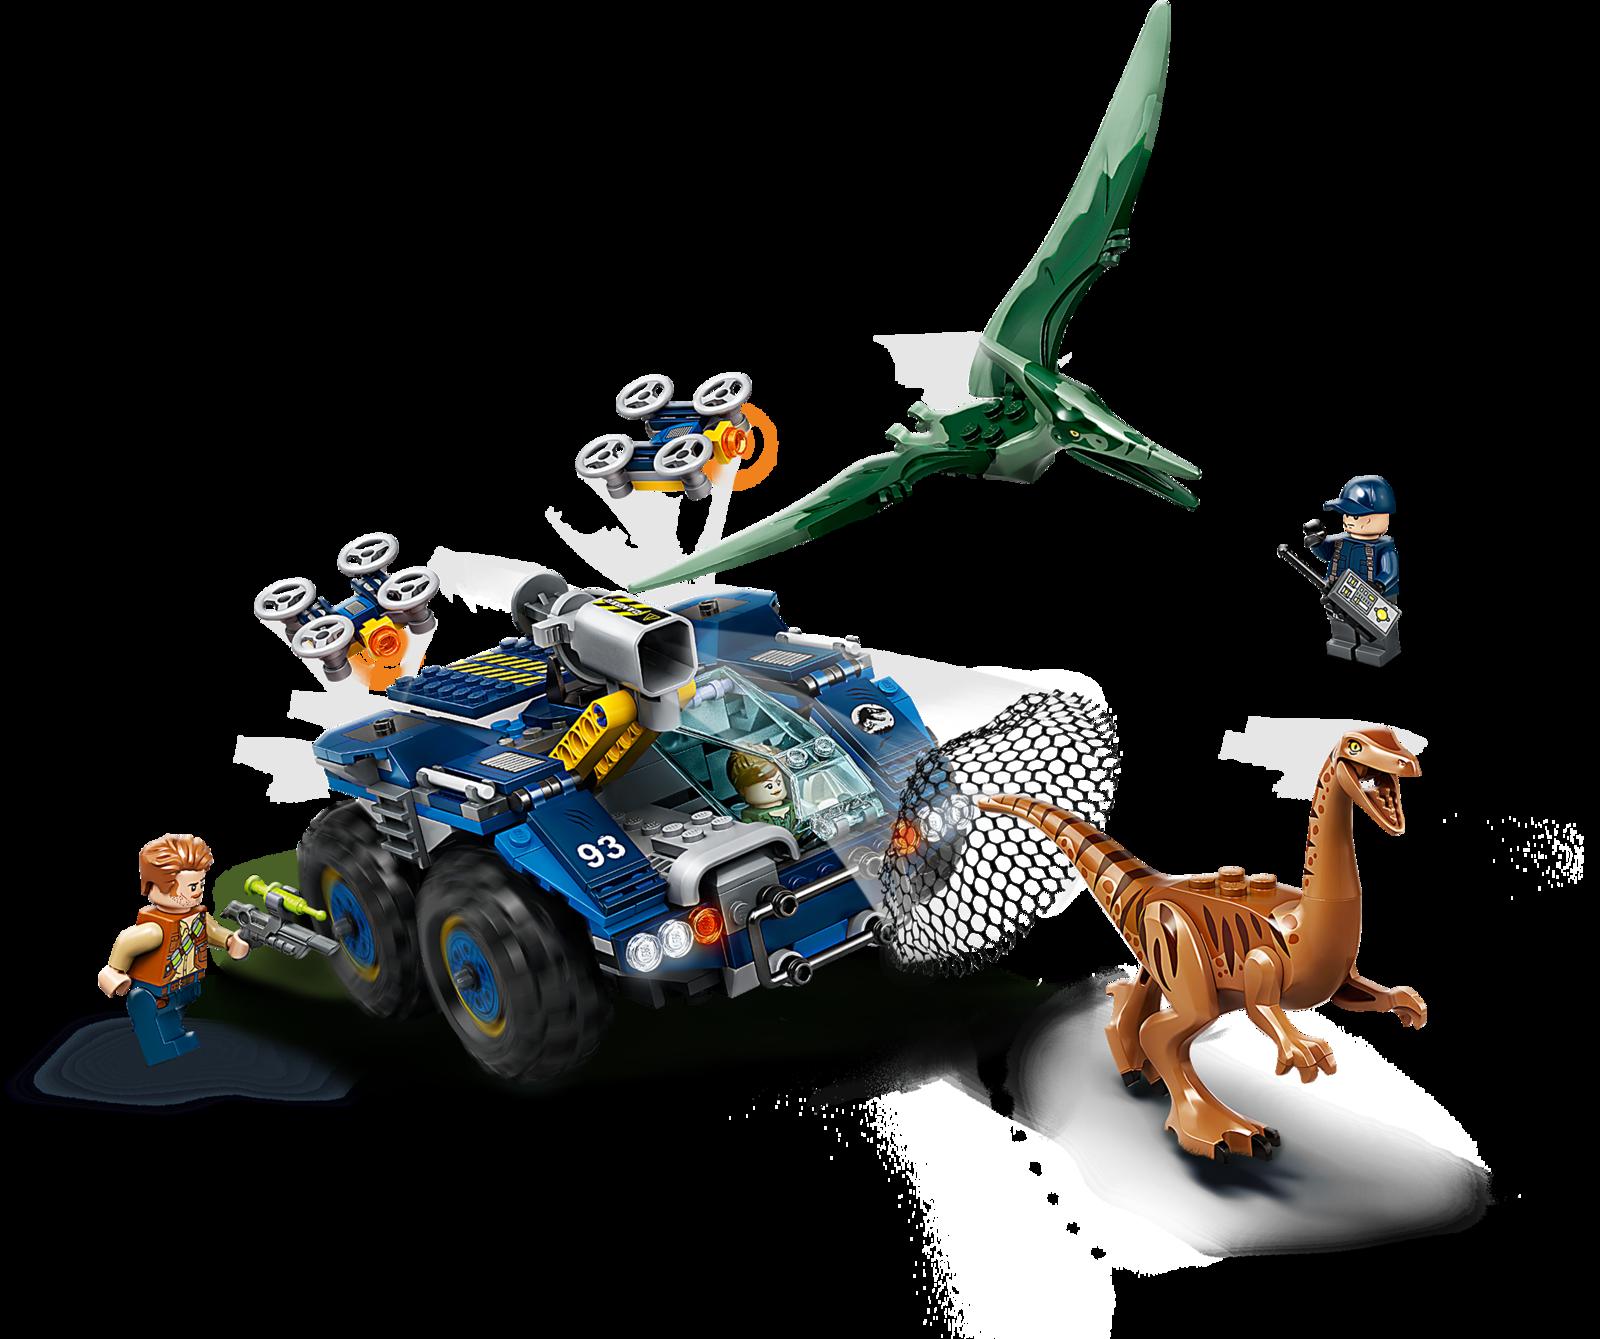 LEGO Jurassic World - Gallimimus & Pteranodon Breakout (75940) image